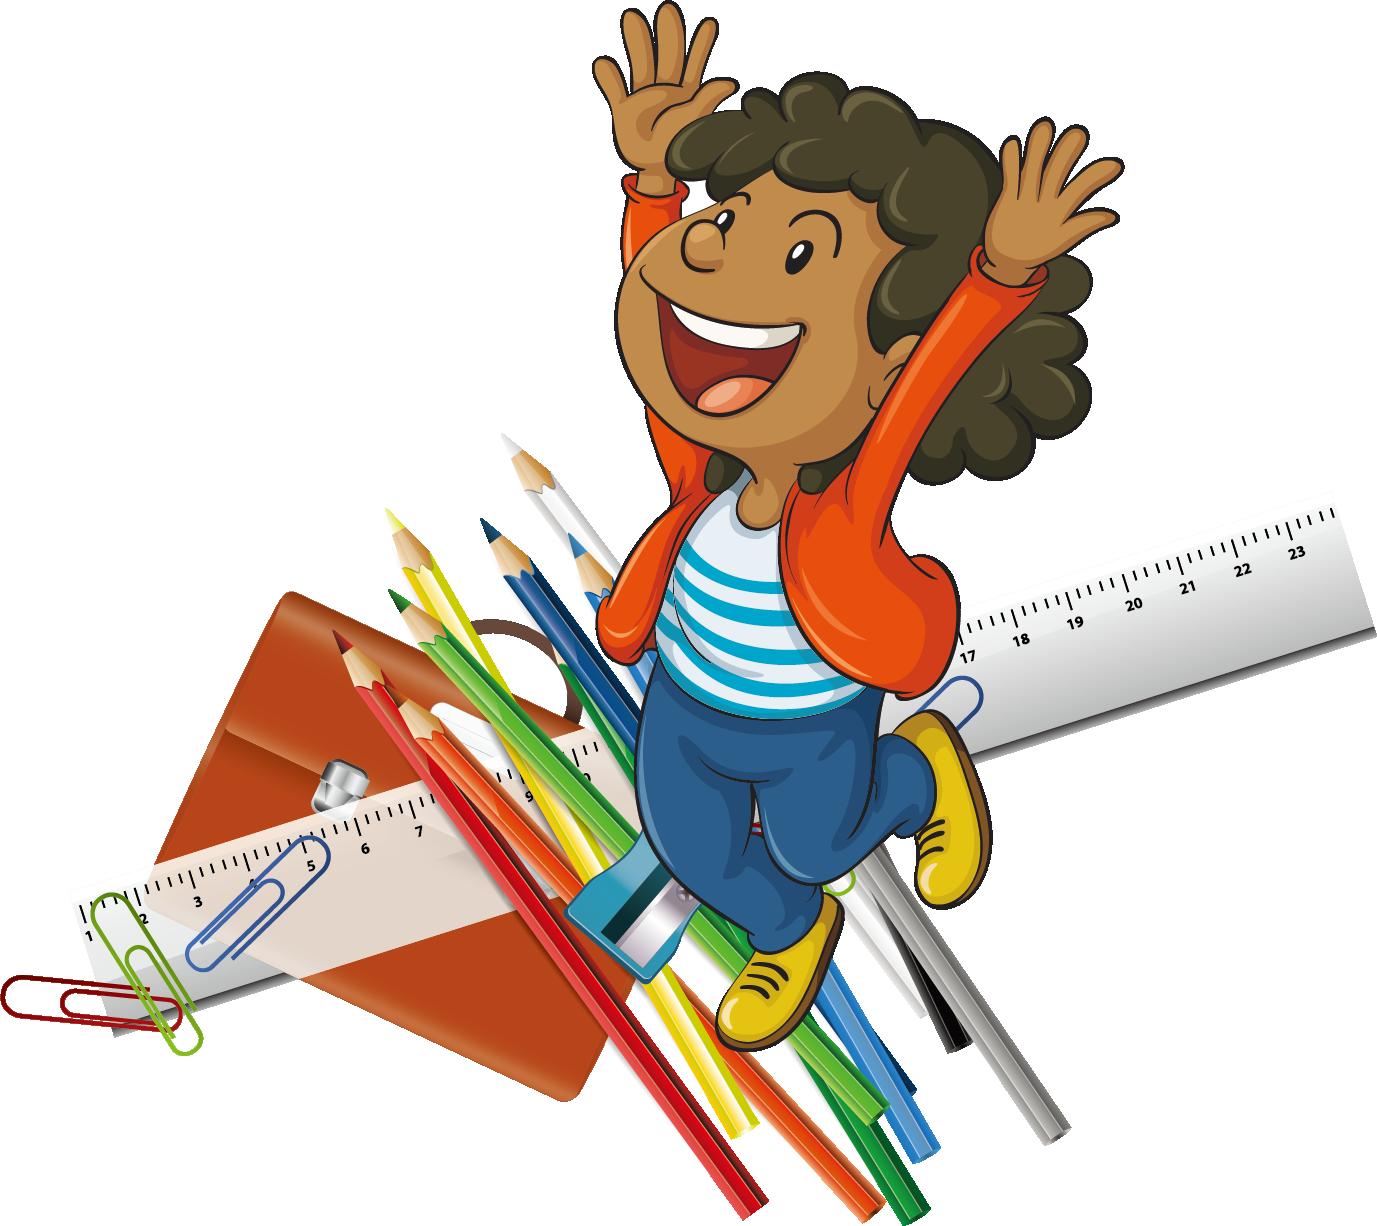 Cartoon drawing illustration pencil. Clipart ruler animated